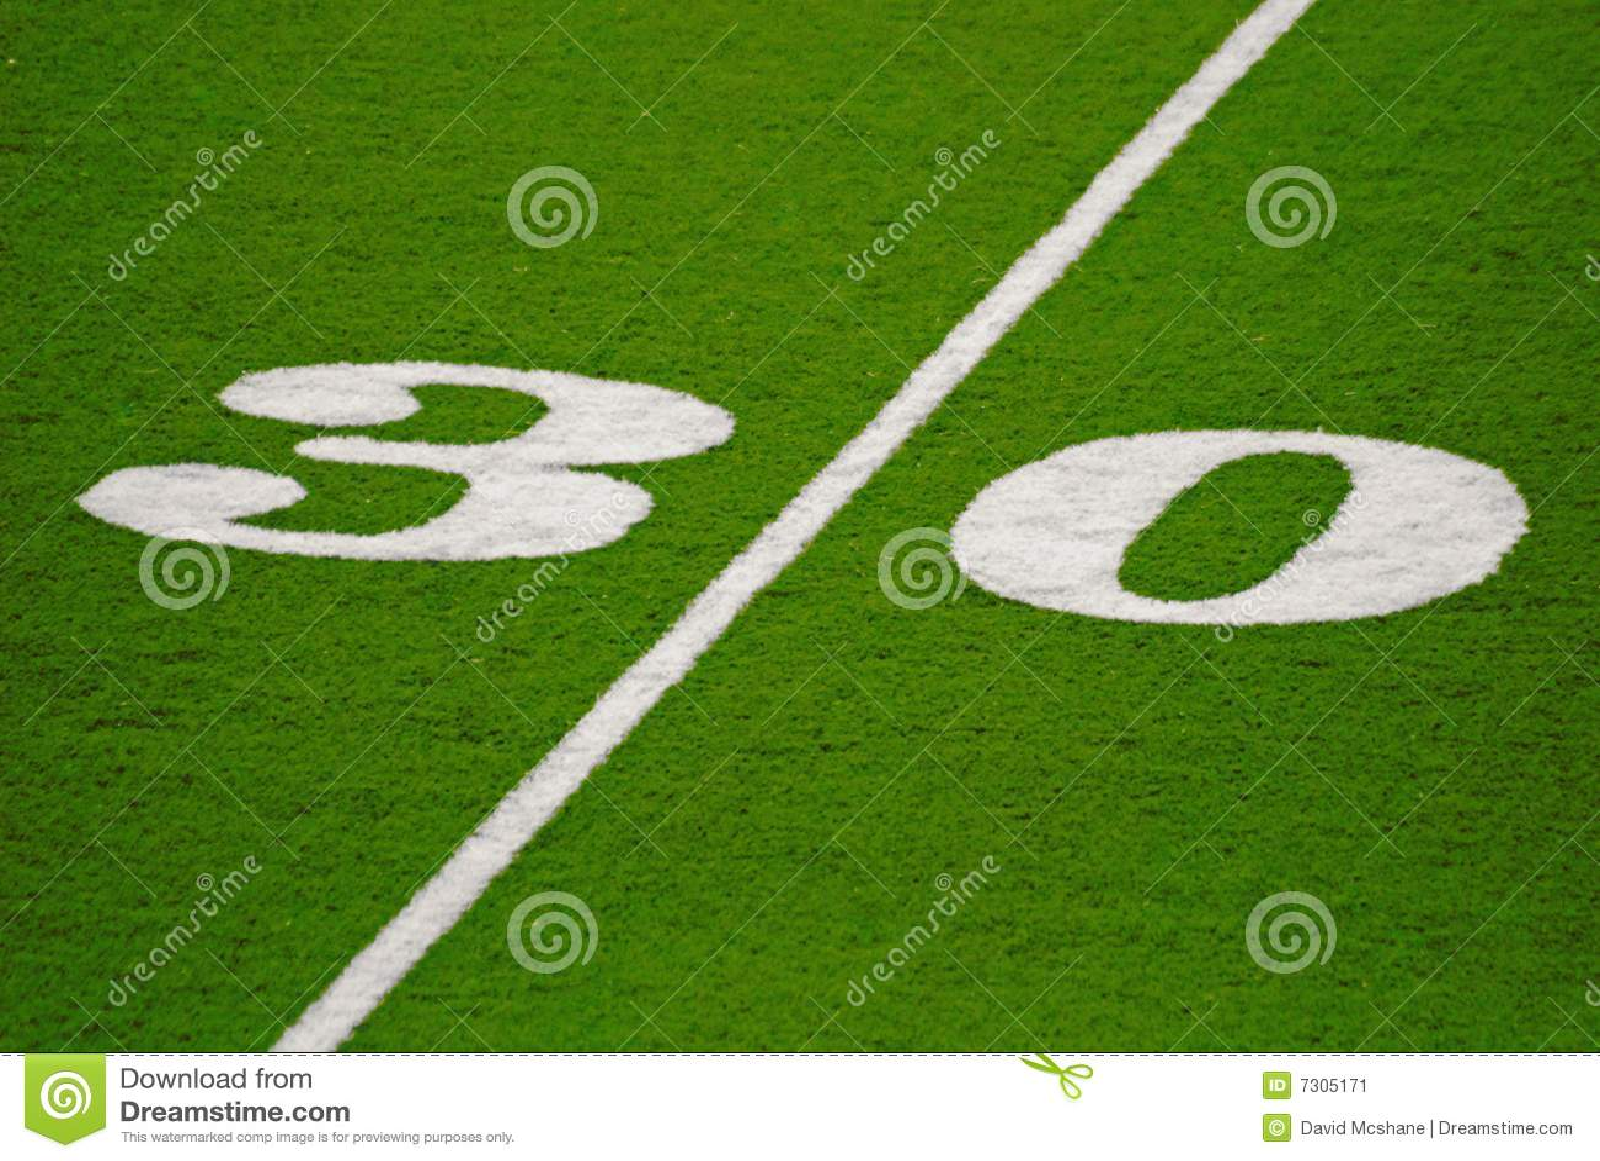 Linea delle yard trenta